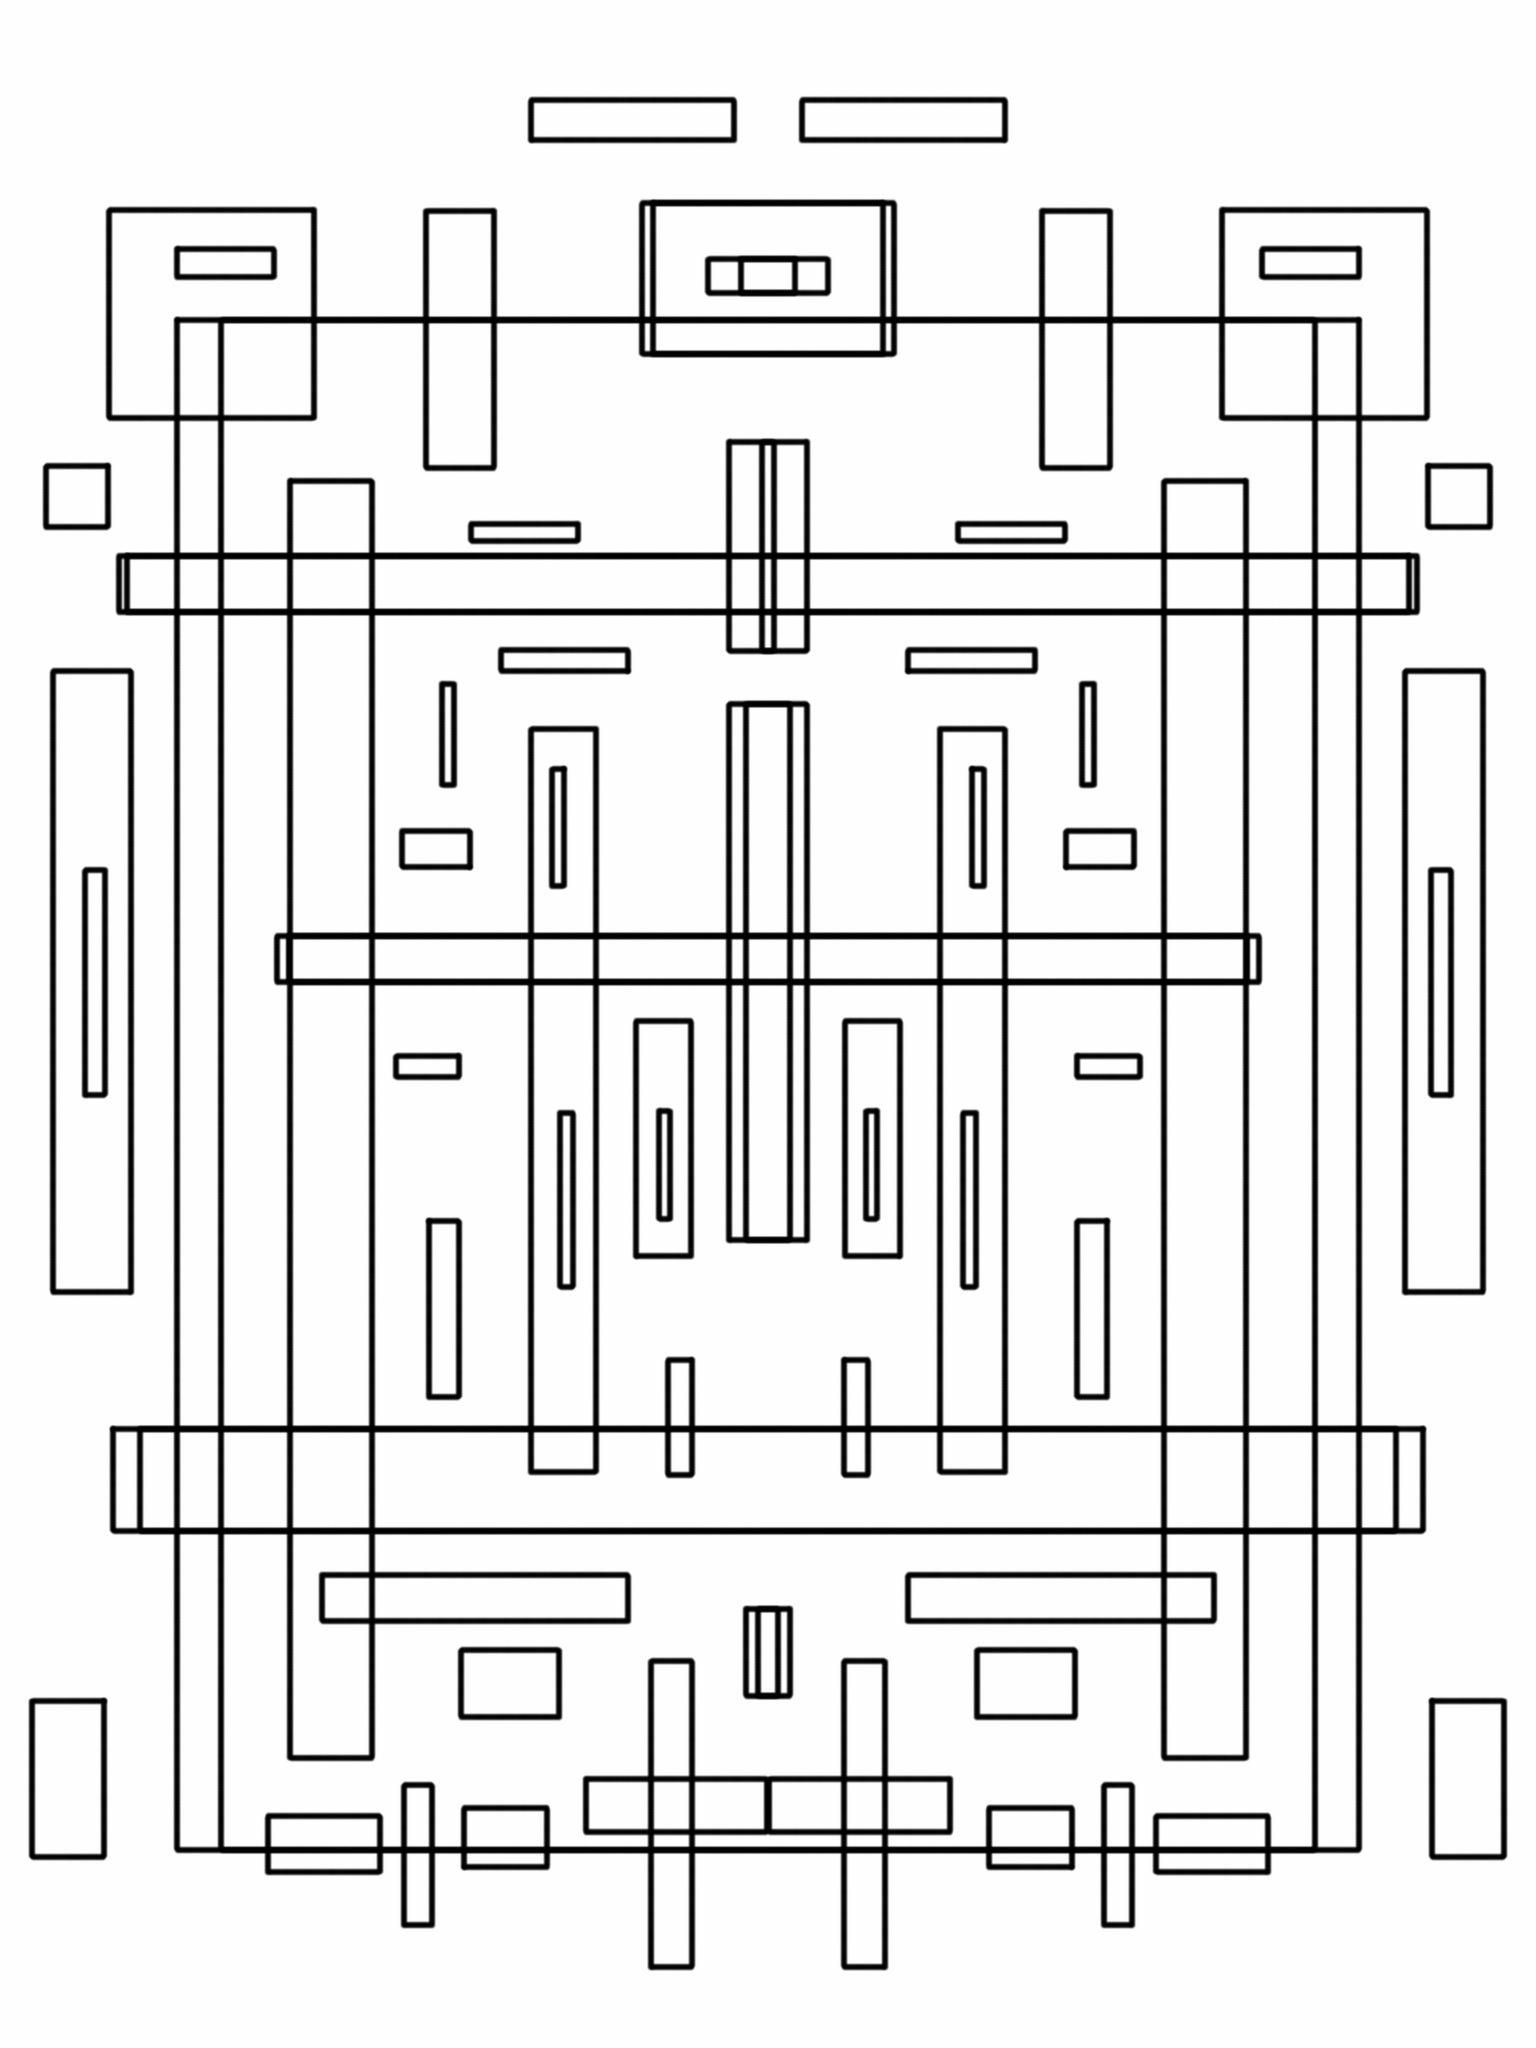 Tractacus logico-flippé 2